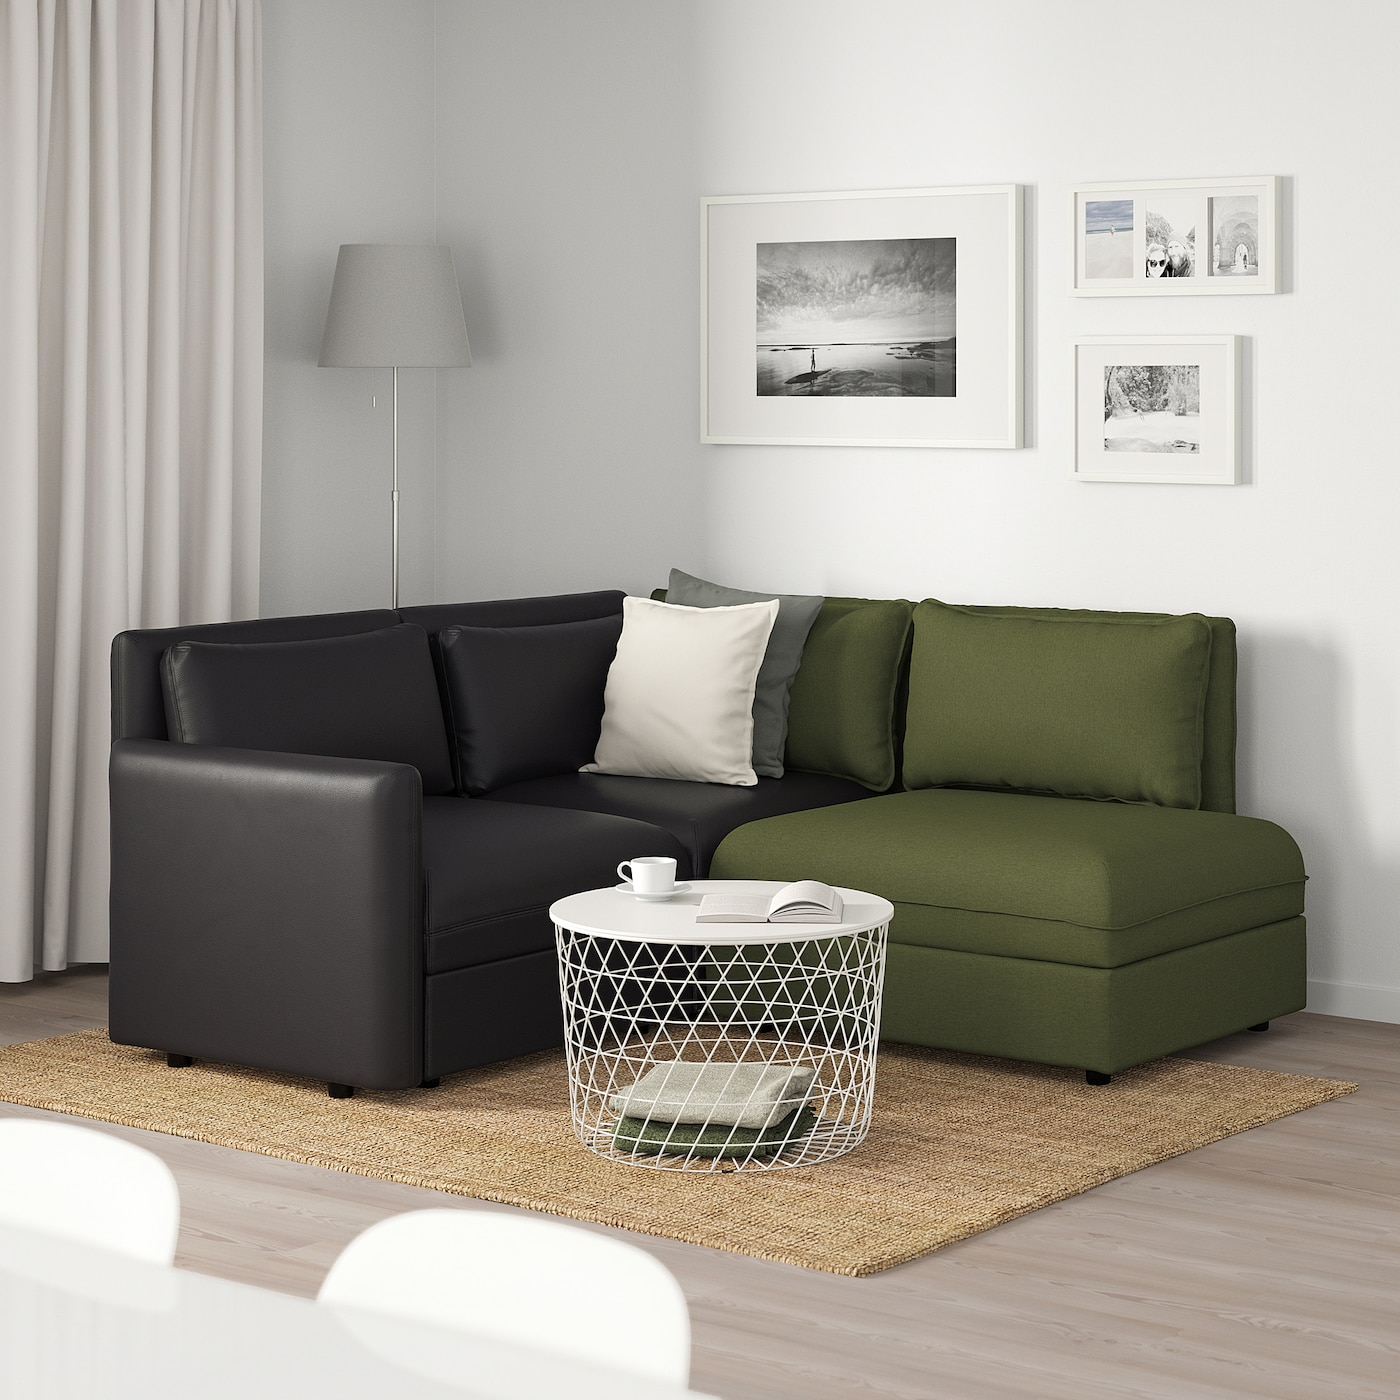 Vallentuna 3 Seat Modular Sofa With Storage Murum Orrsta Black Olive Green Ikea